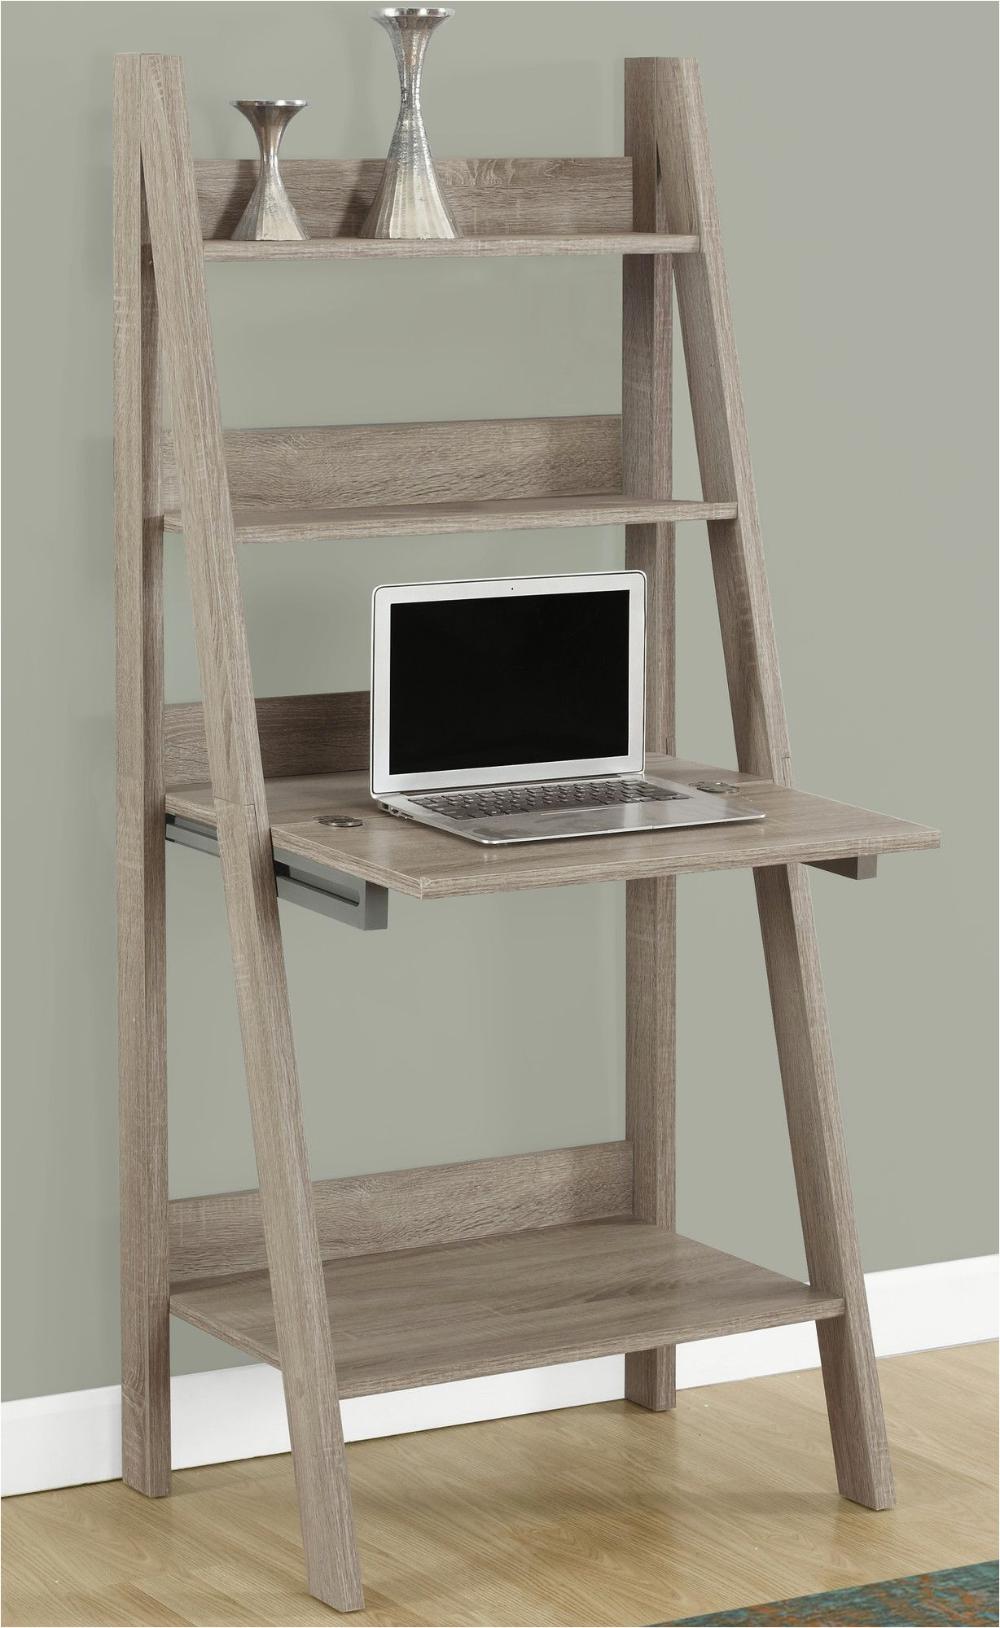 Diy Leaning Shelves Hinhnenvip Com Desks For Small Spaces Easy Home Decor Wood Ladder Shelf